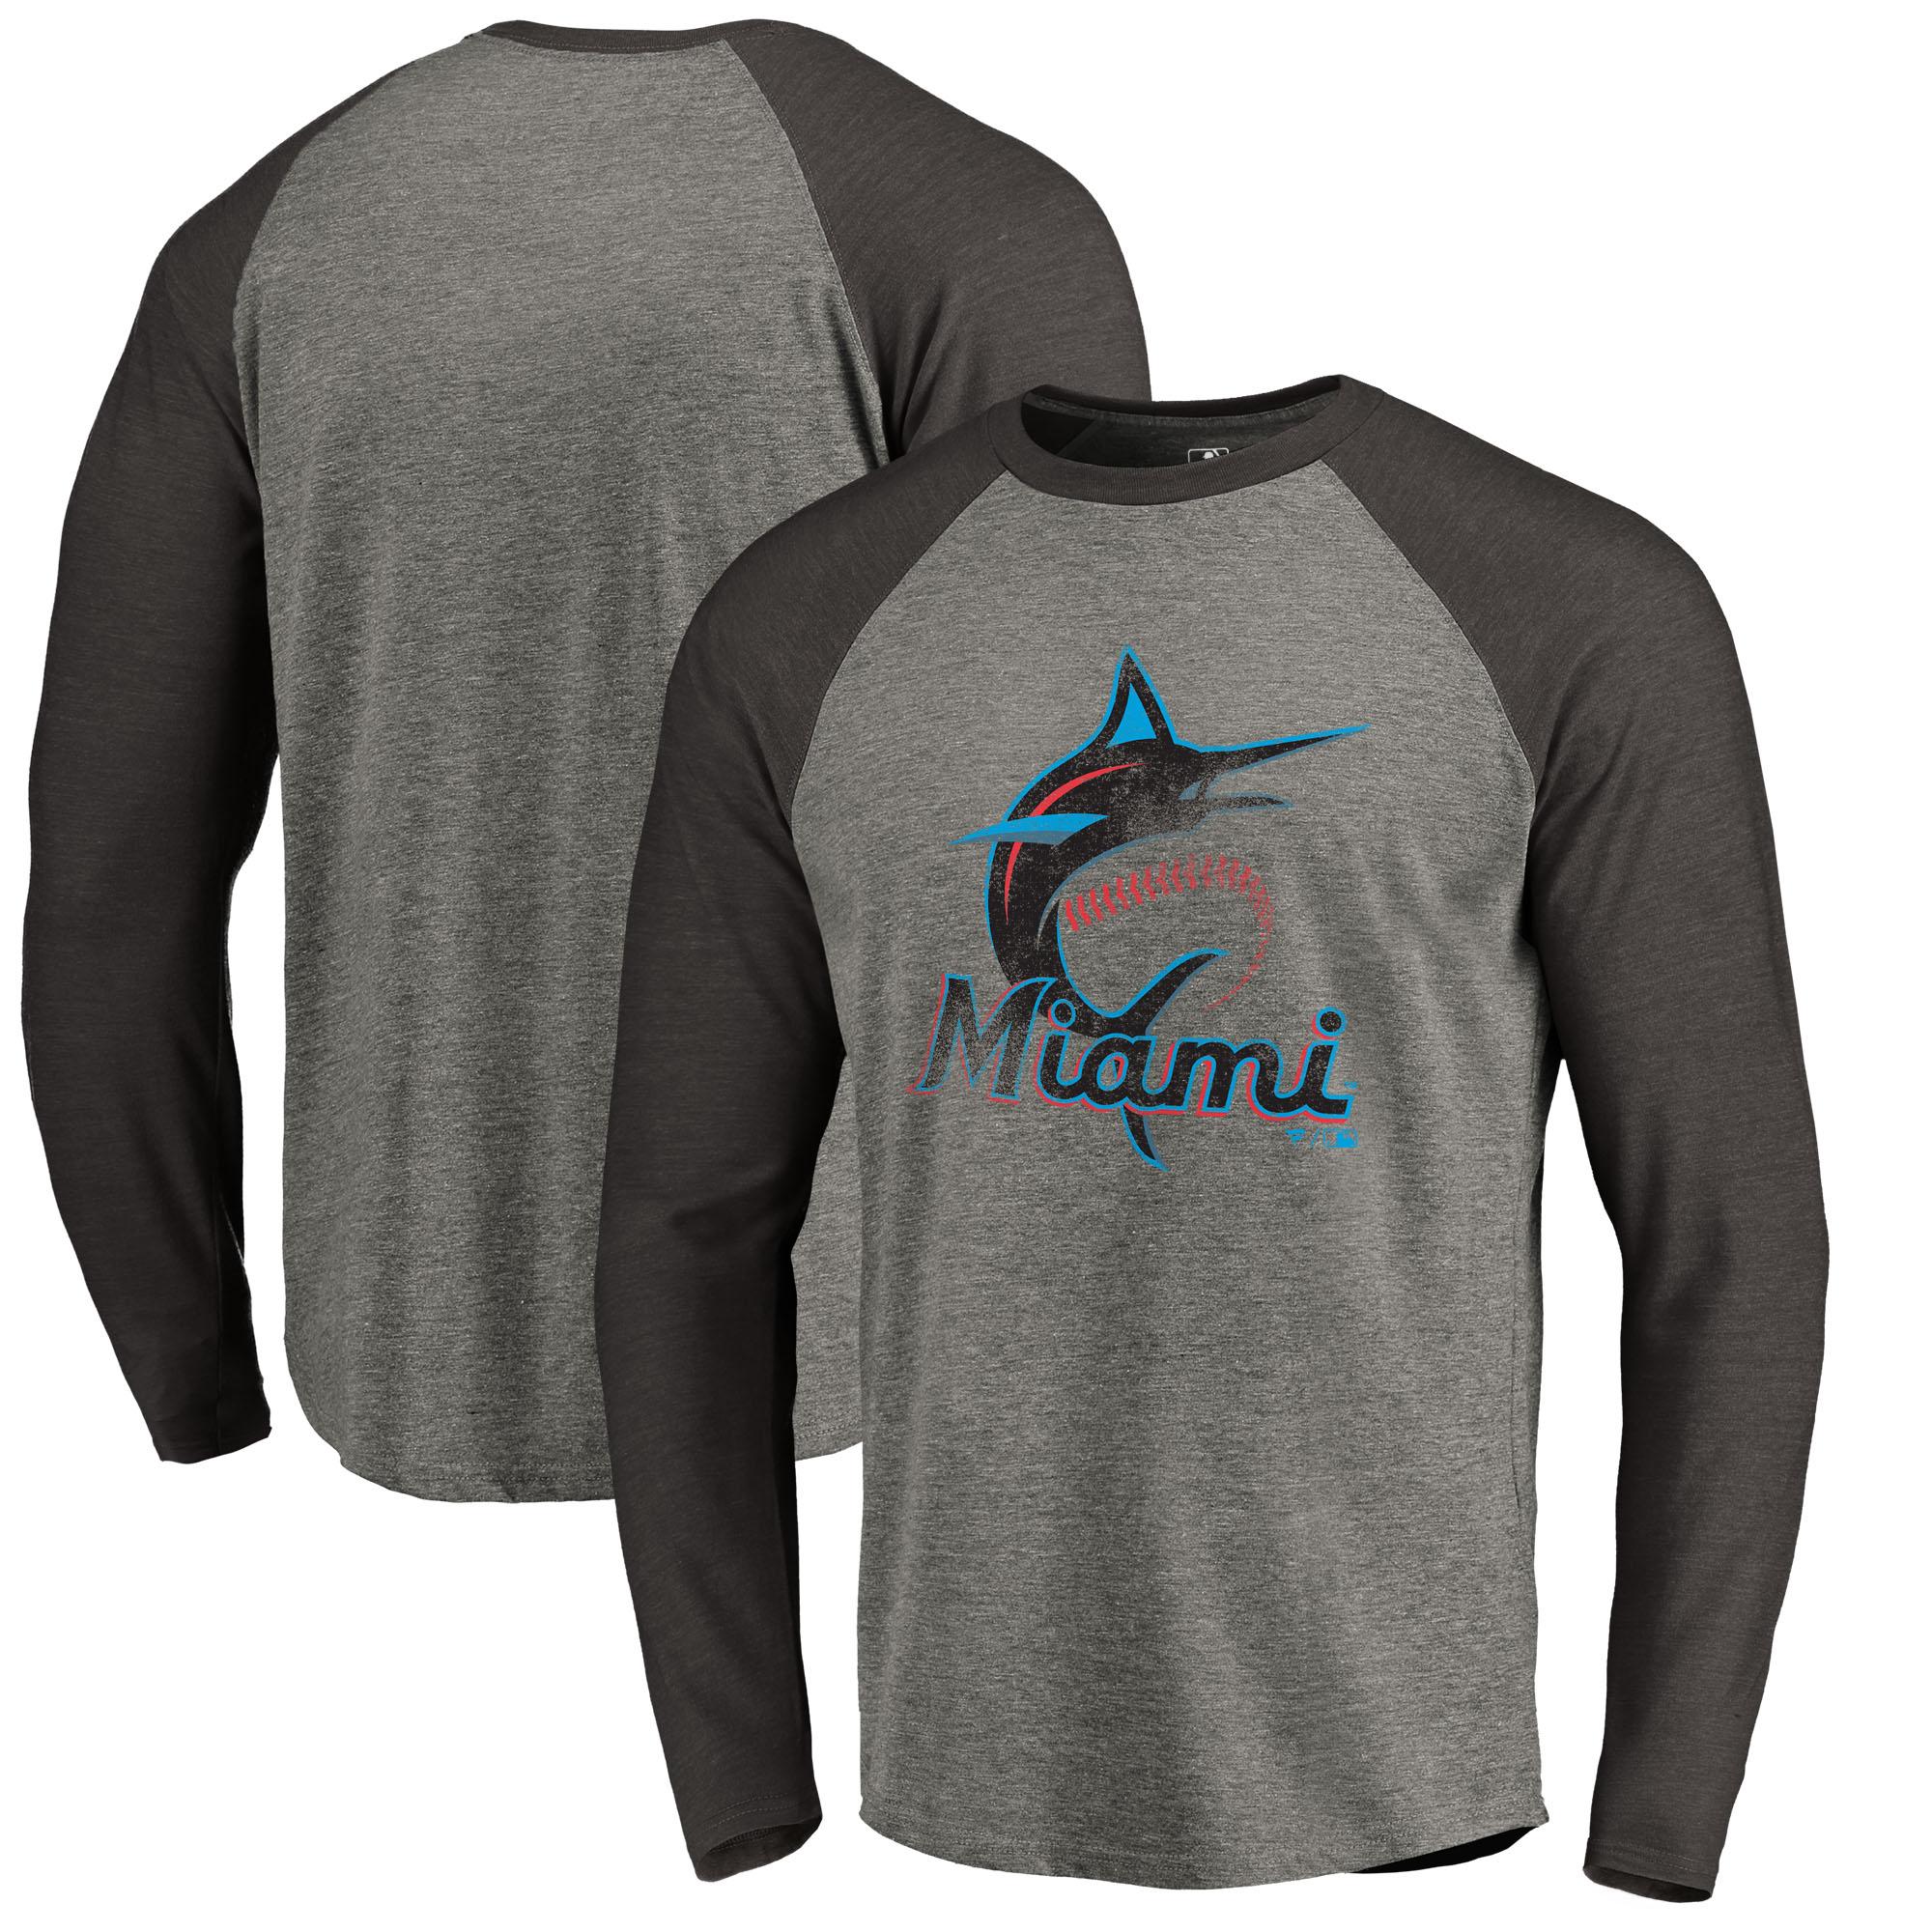 Miami Marlins Distressed Team Raglan Tri-Blend Long Sleeve T-Shirt - Ash